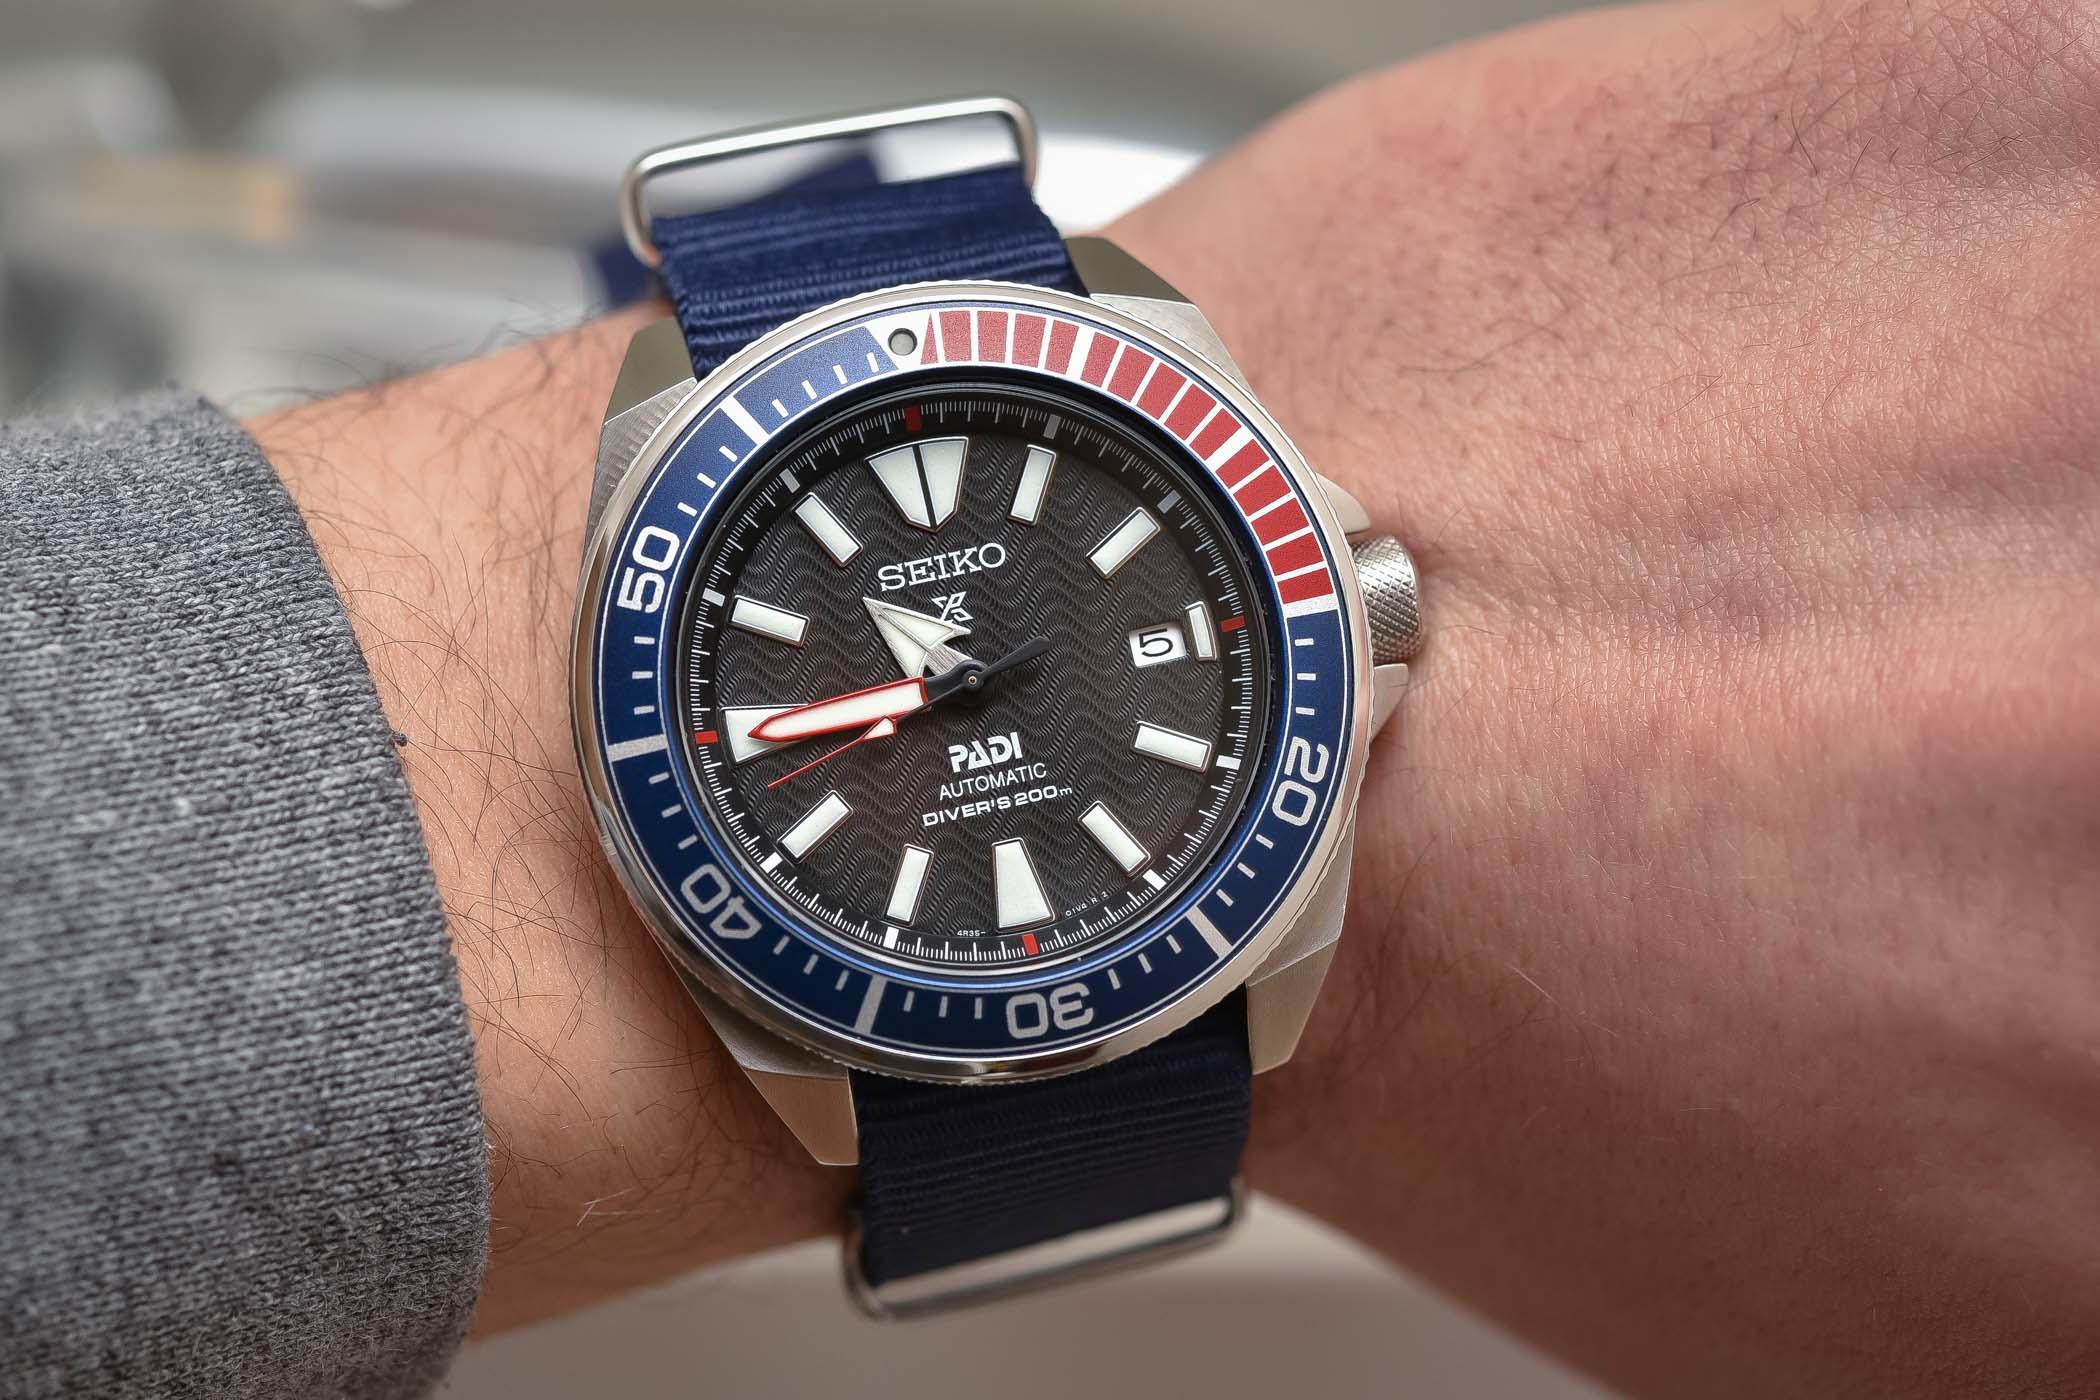 Seiko Prospex Automatic Diver Padi Samurai SRPB99J1 - Review